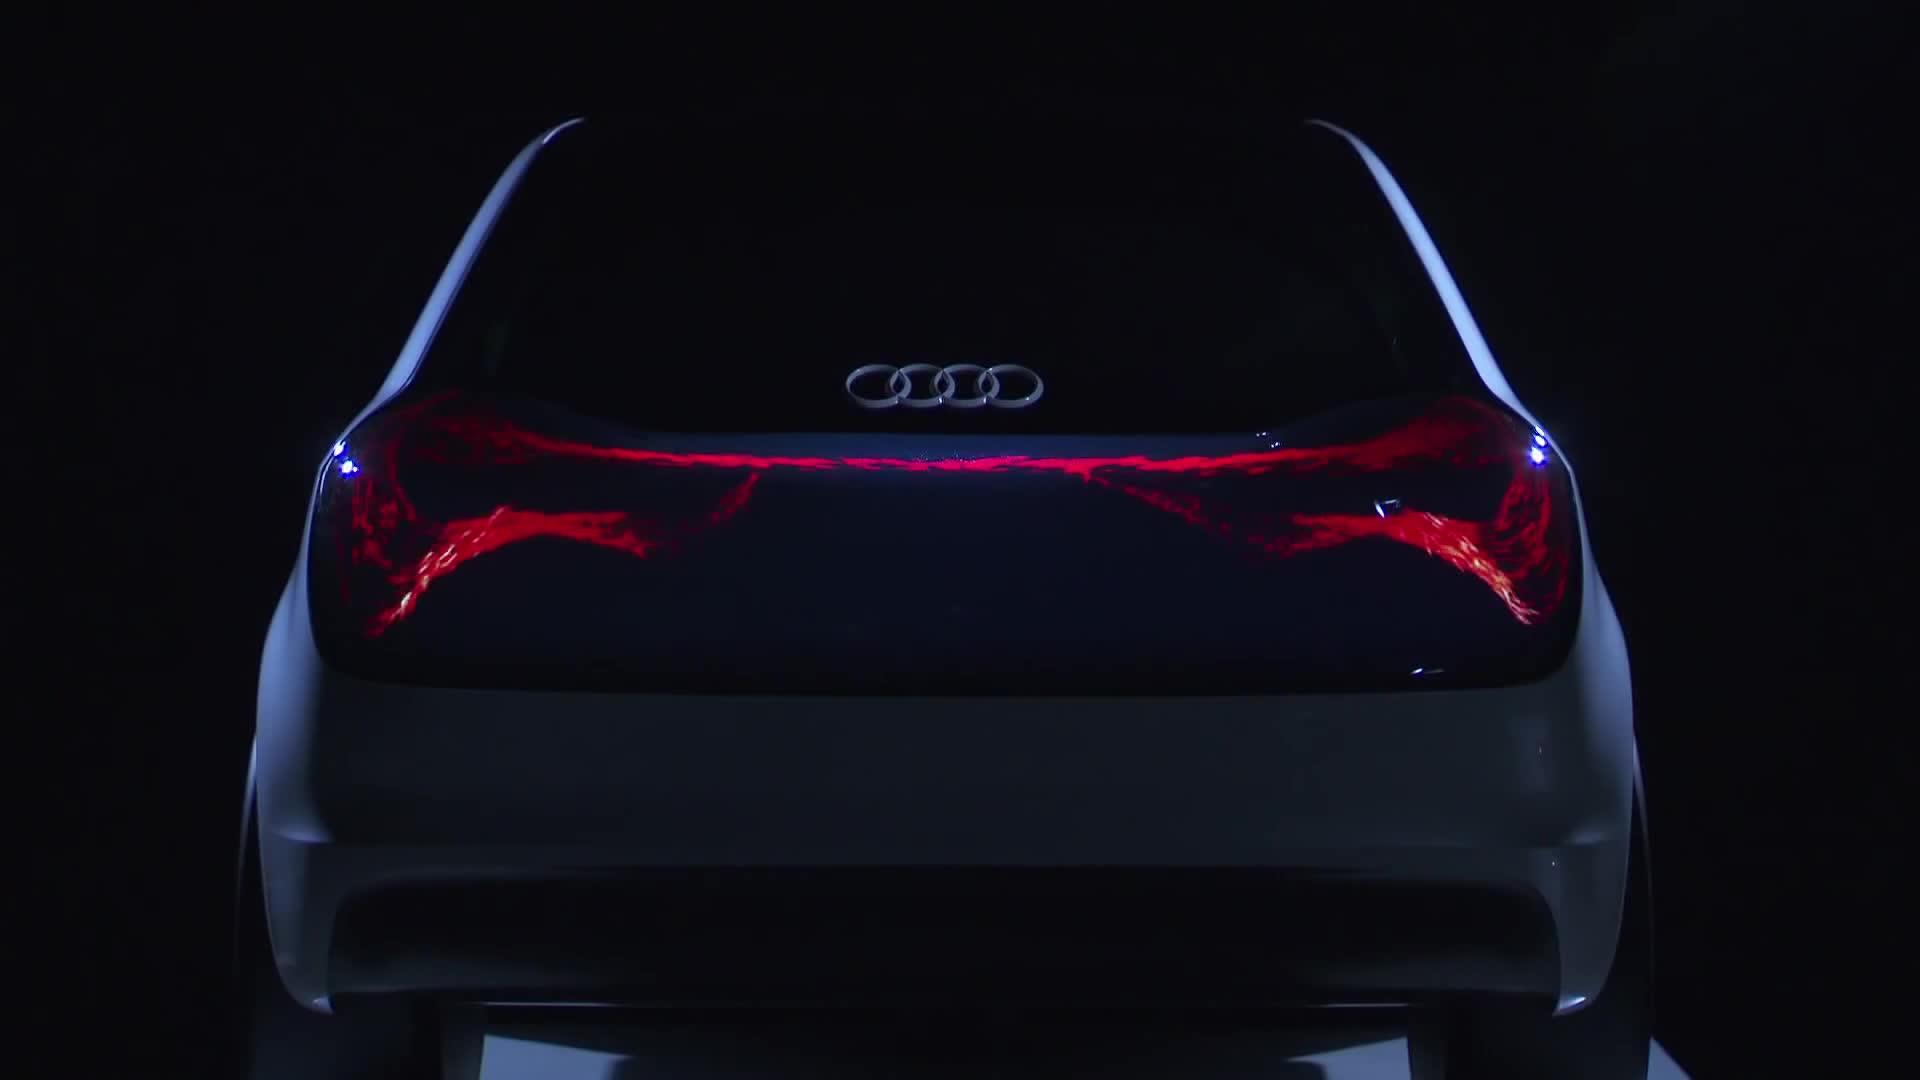 RocketLeague, oled, rocket league, Audi OLED Swarm GIFs